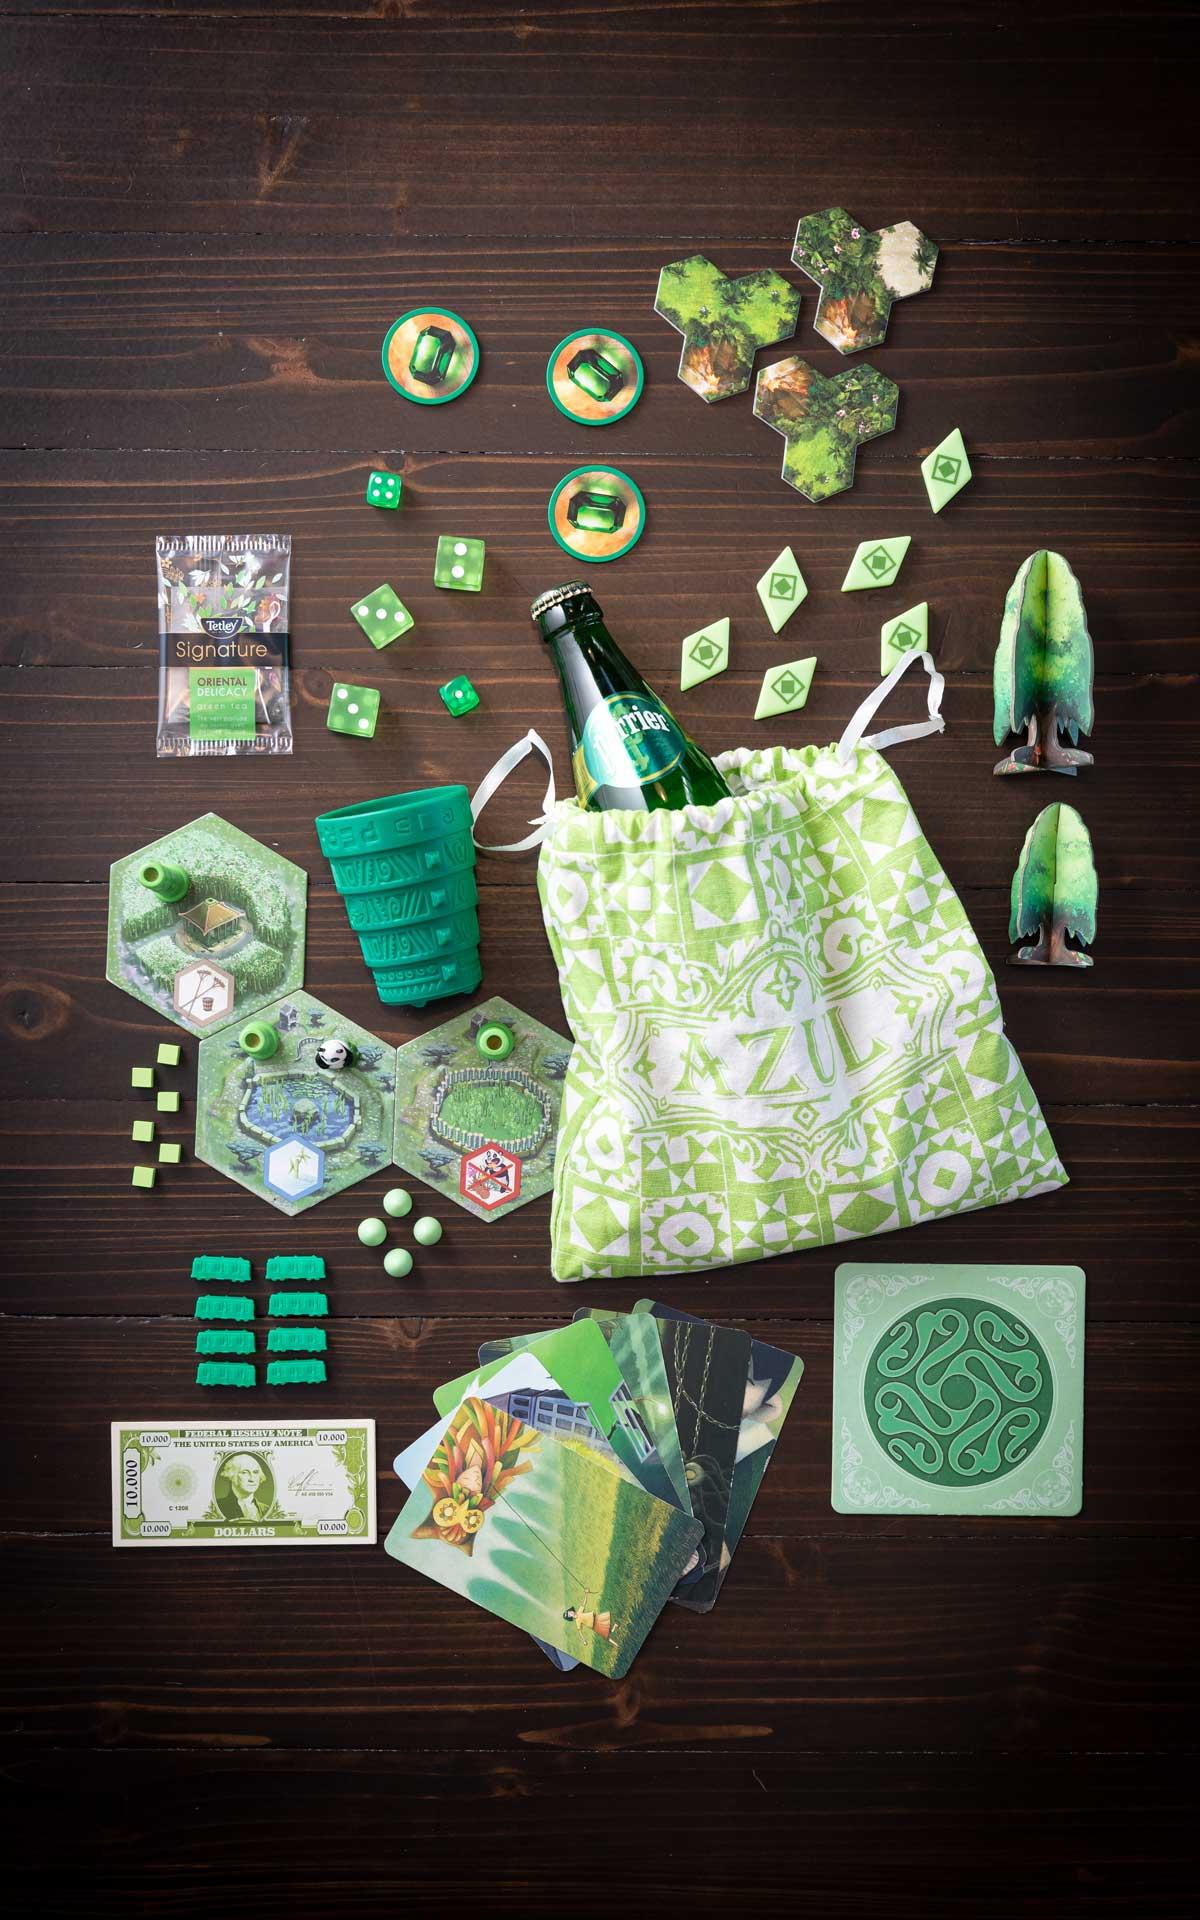 green_1200x1920_06-07-21